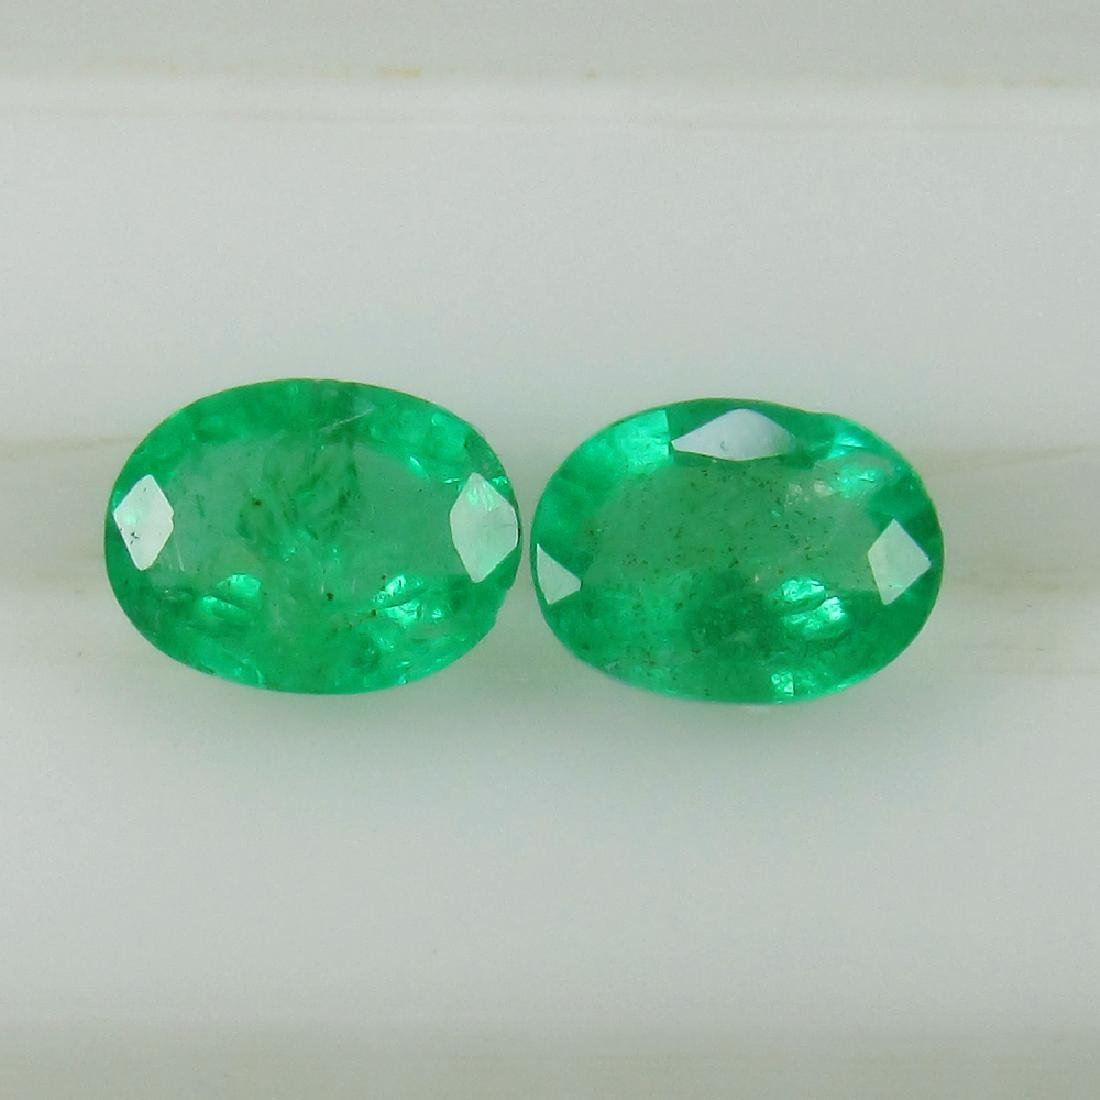 0.62 Ct Genuine Zambian Emerald Oval Pair